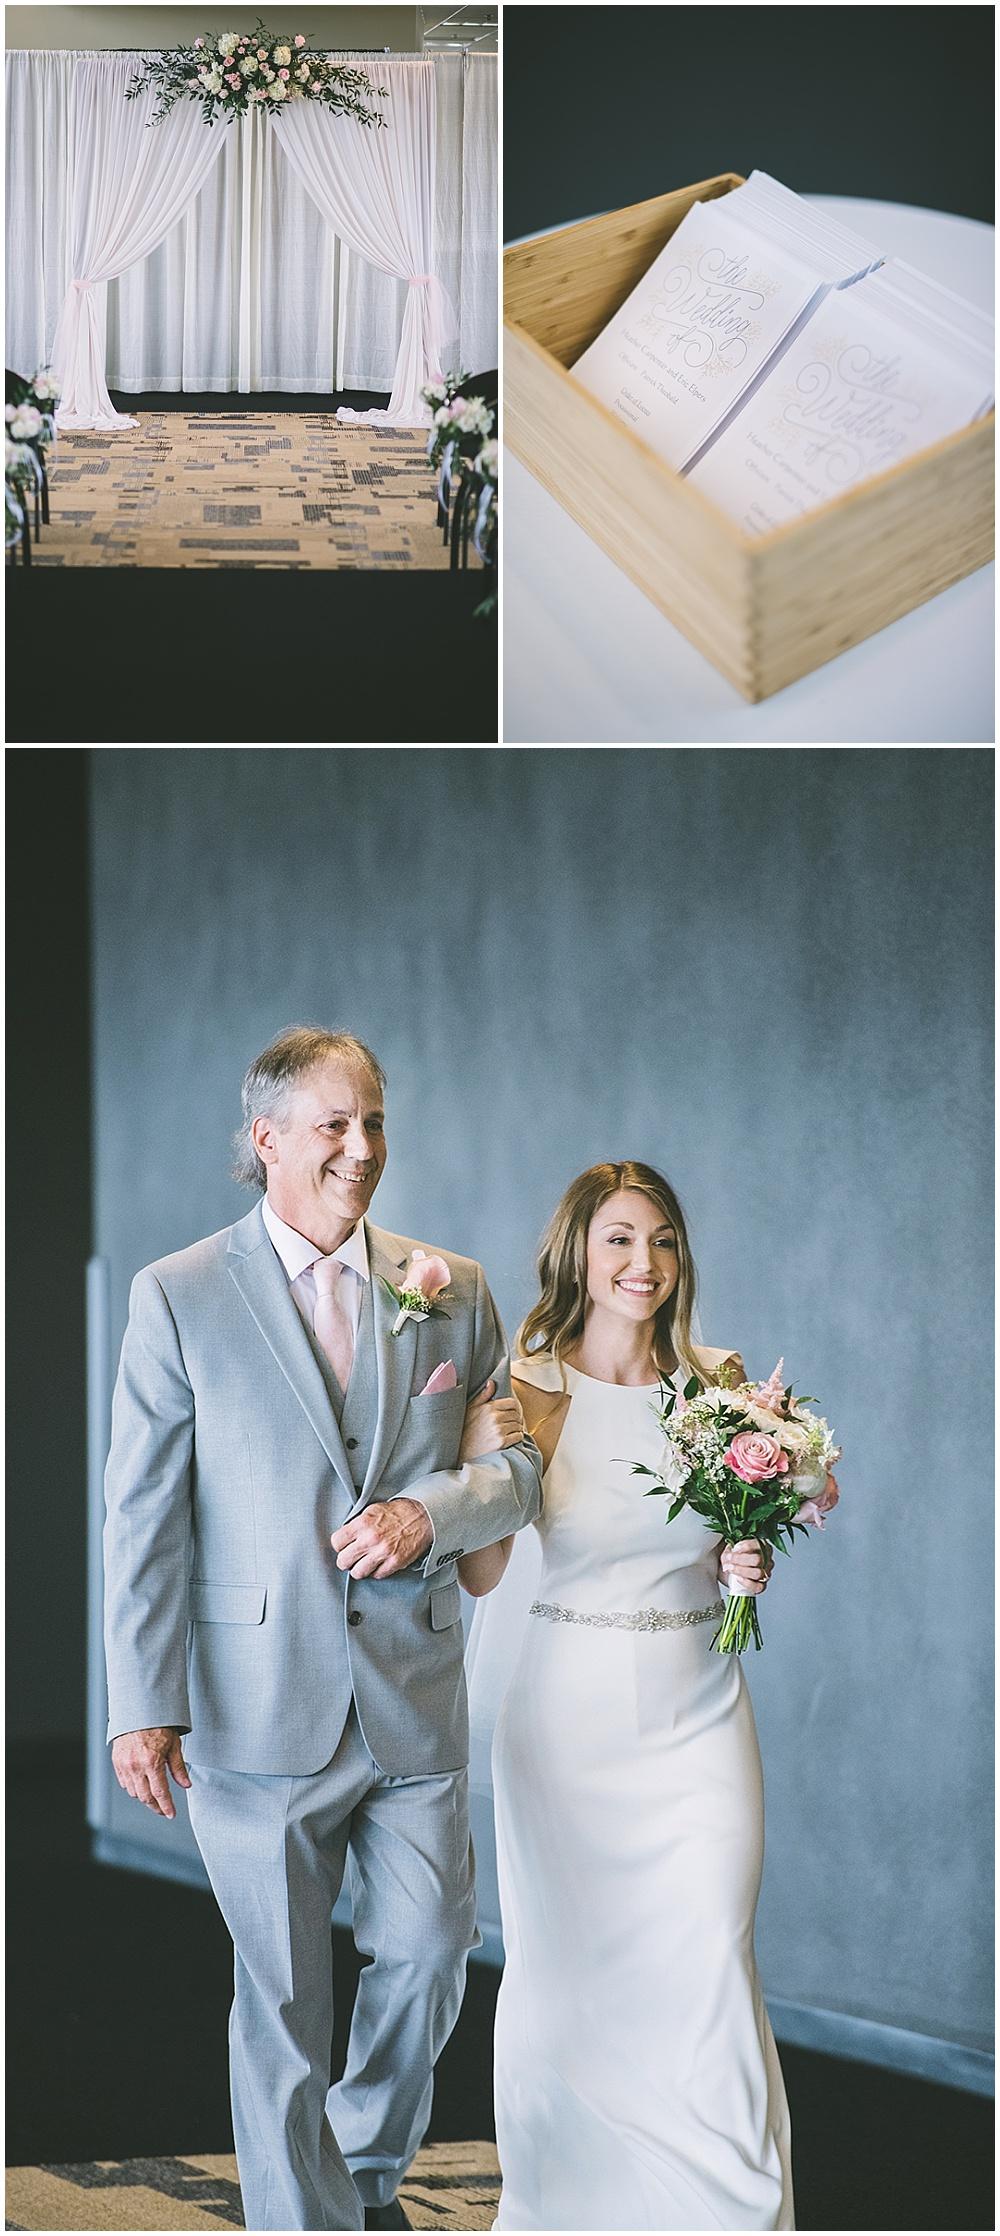 A garden-inspired Purdue University wedding | Purdue alumni wedding, shively club wedding, boilermaker wedding, blush wedding, ceremony draping